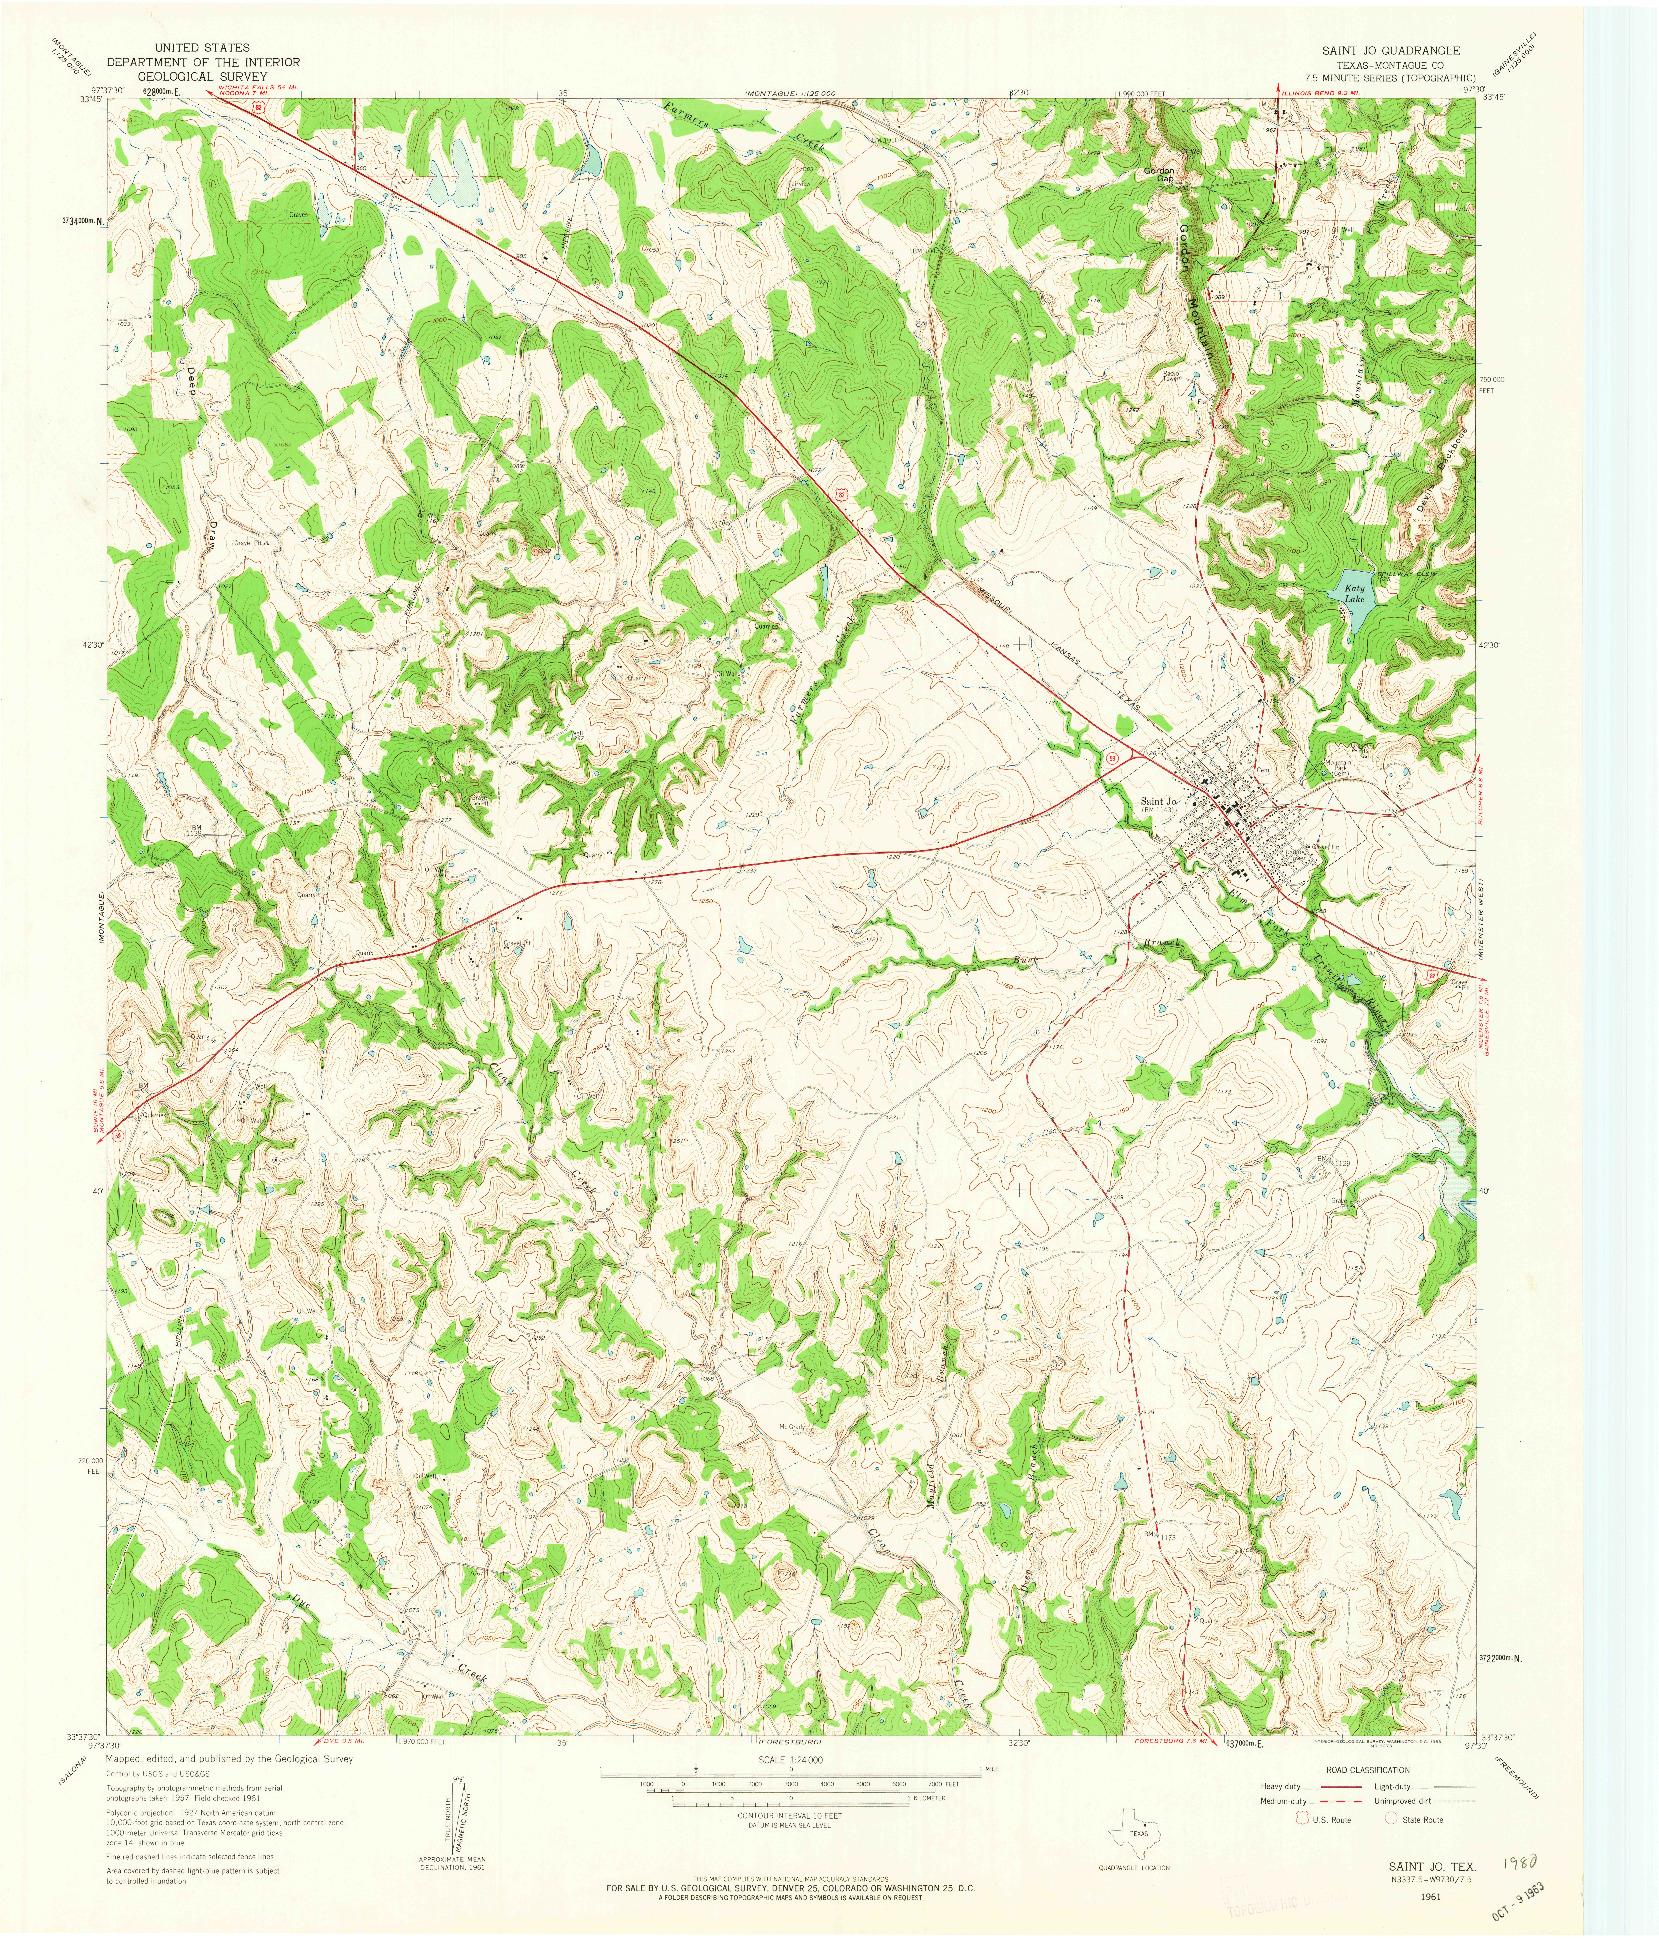 USGS 1:24000-SCALE QUADRANGLE FOR SAINT JO, TX 1961